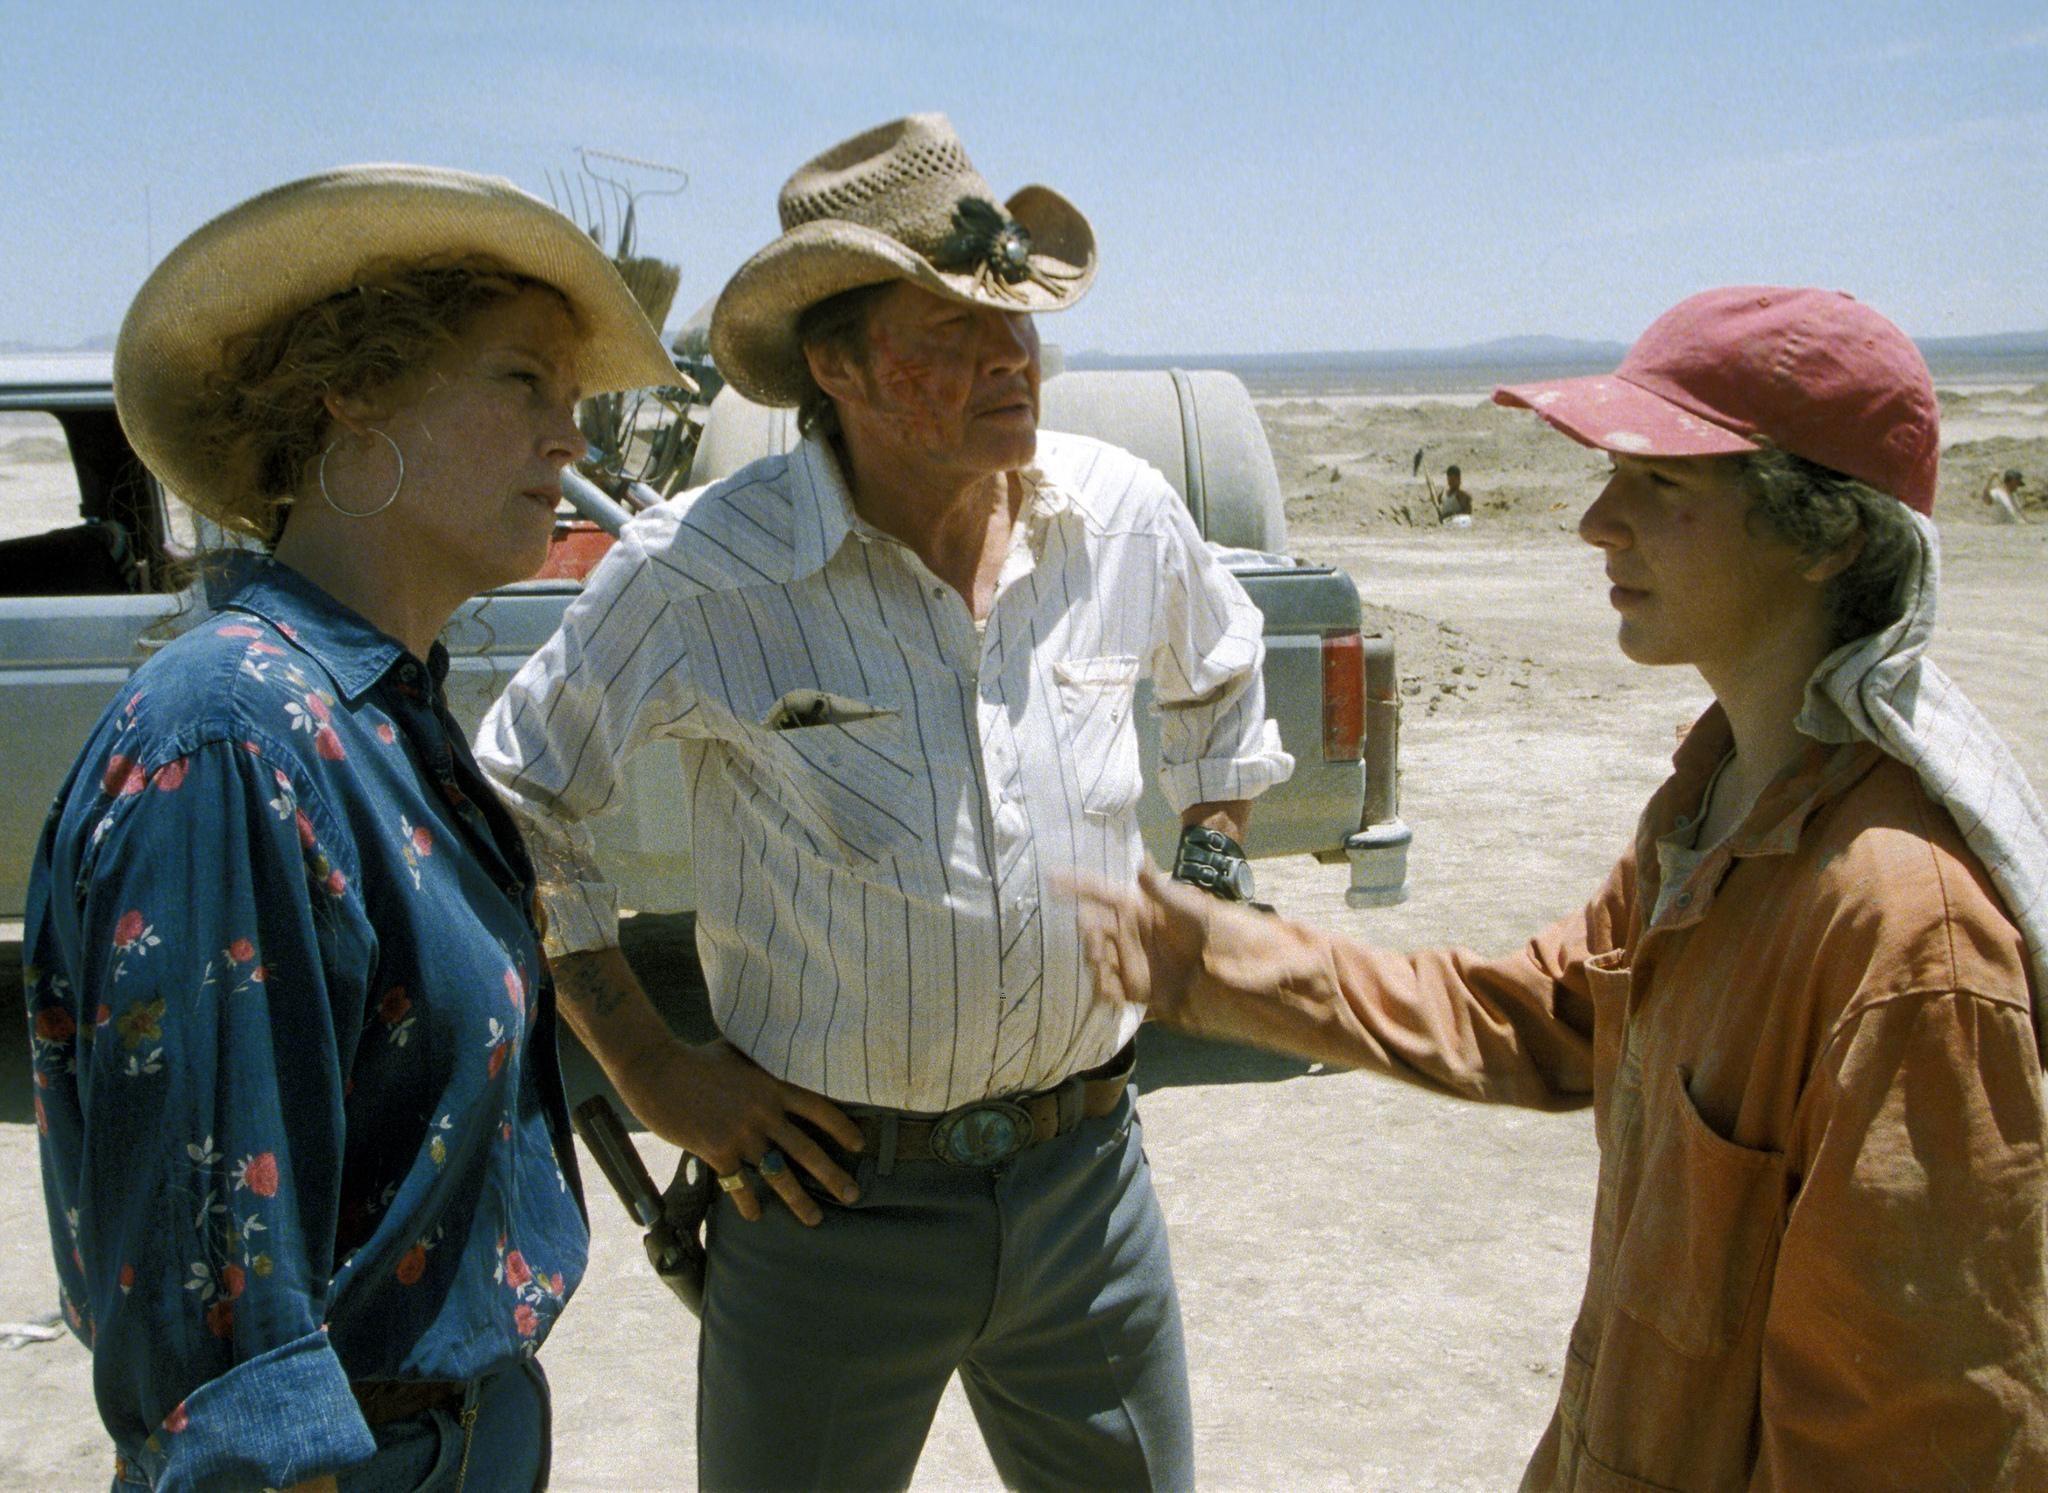 Still of Sigourney Weaver, Jon Voight and Shia LaBeouf in